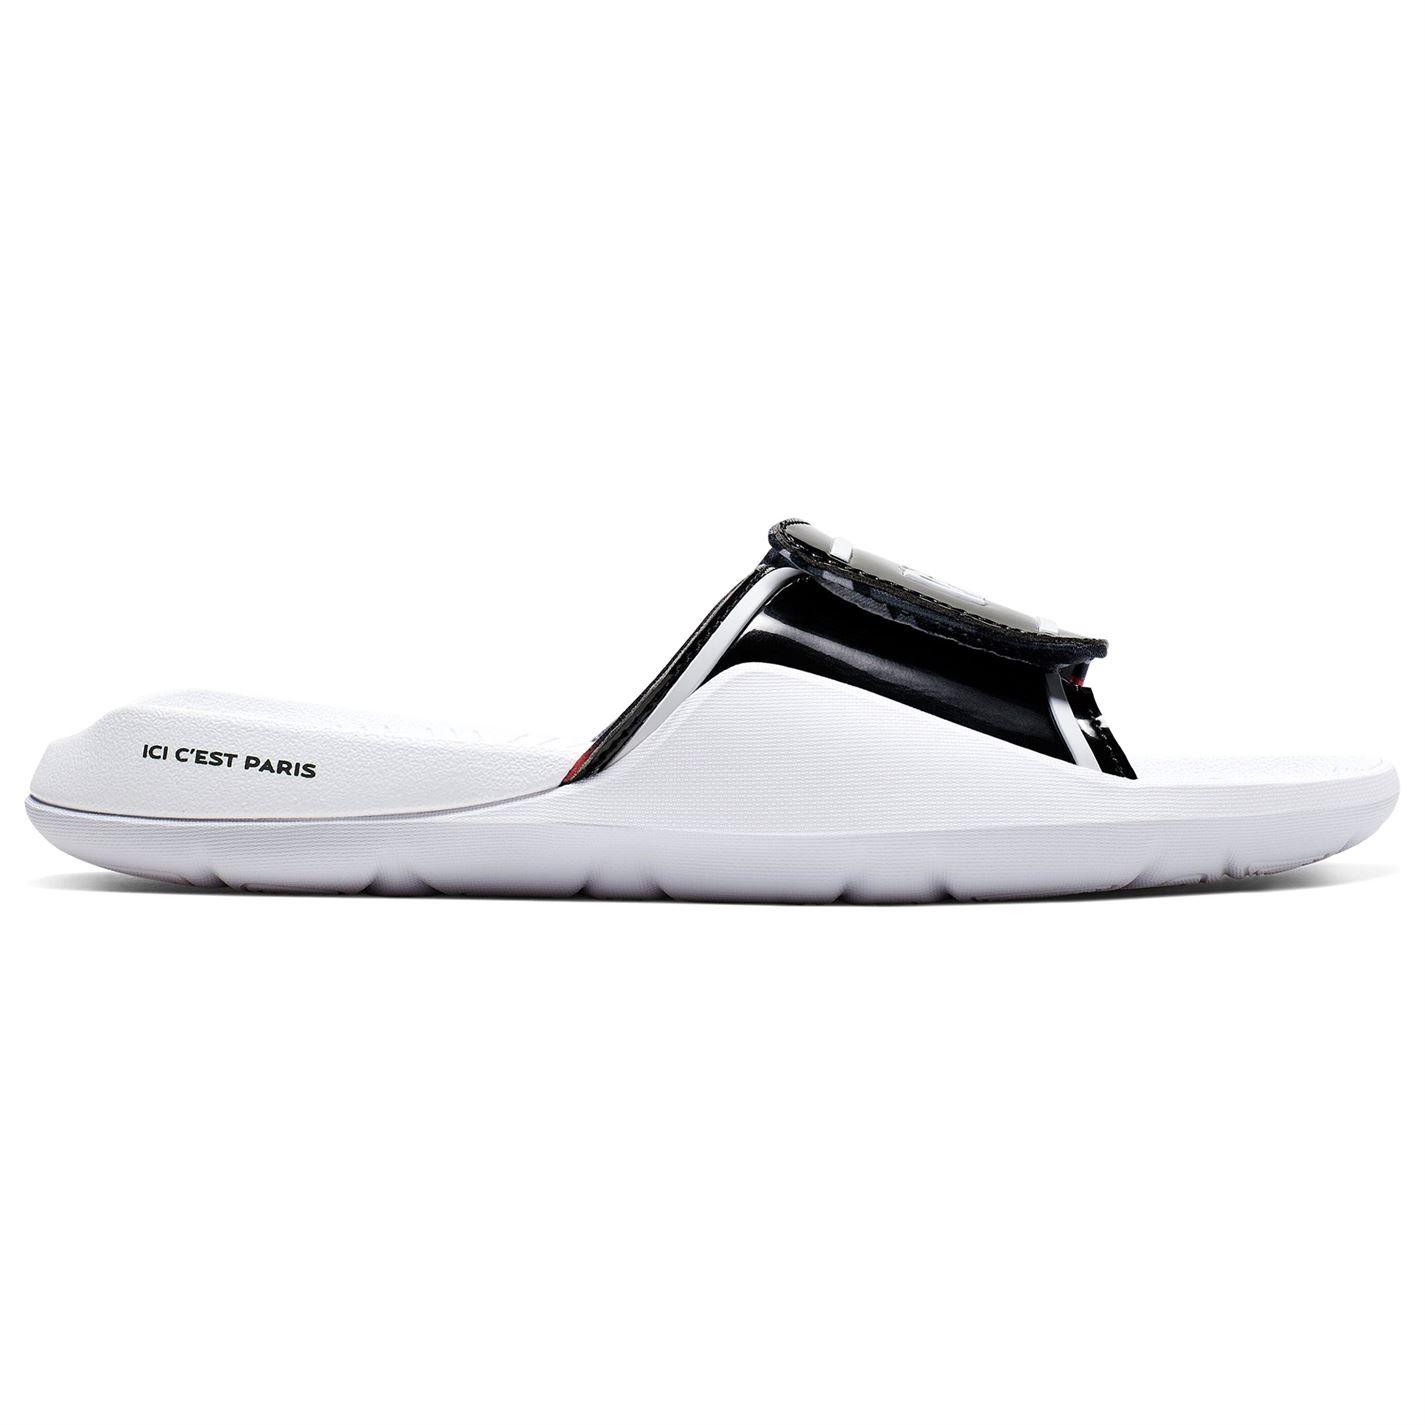 Nike Paris Saint Germain x Jordan Hydro 7 V2 Mens Sliders